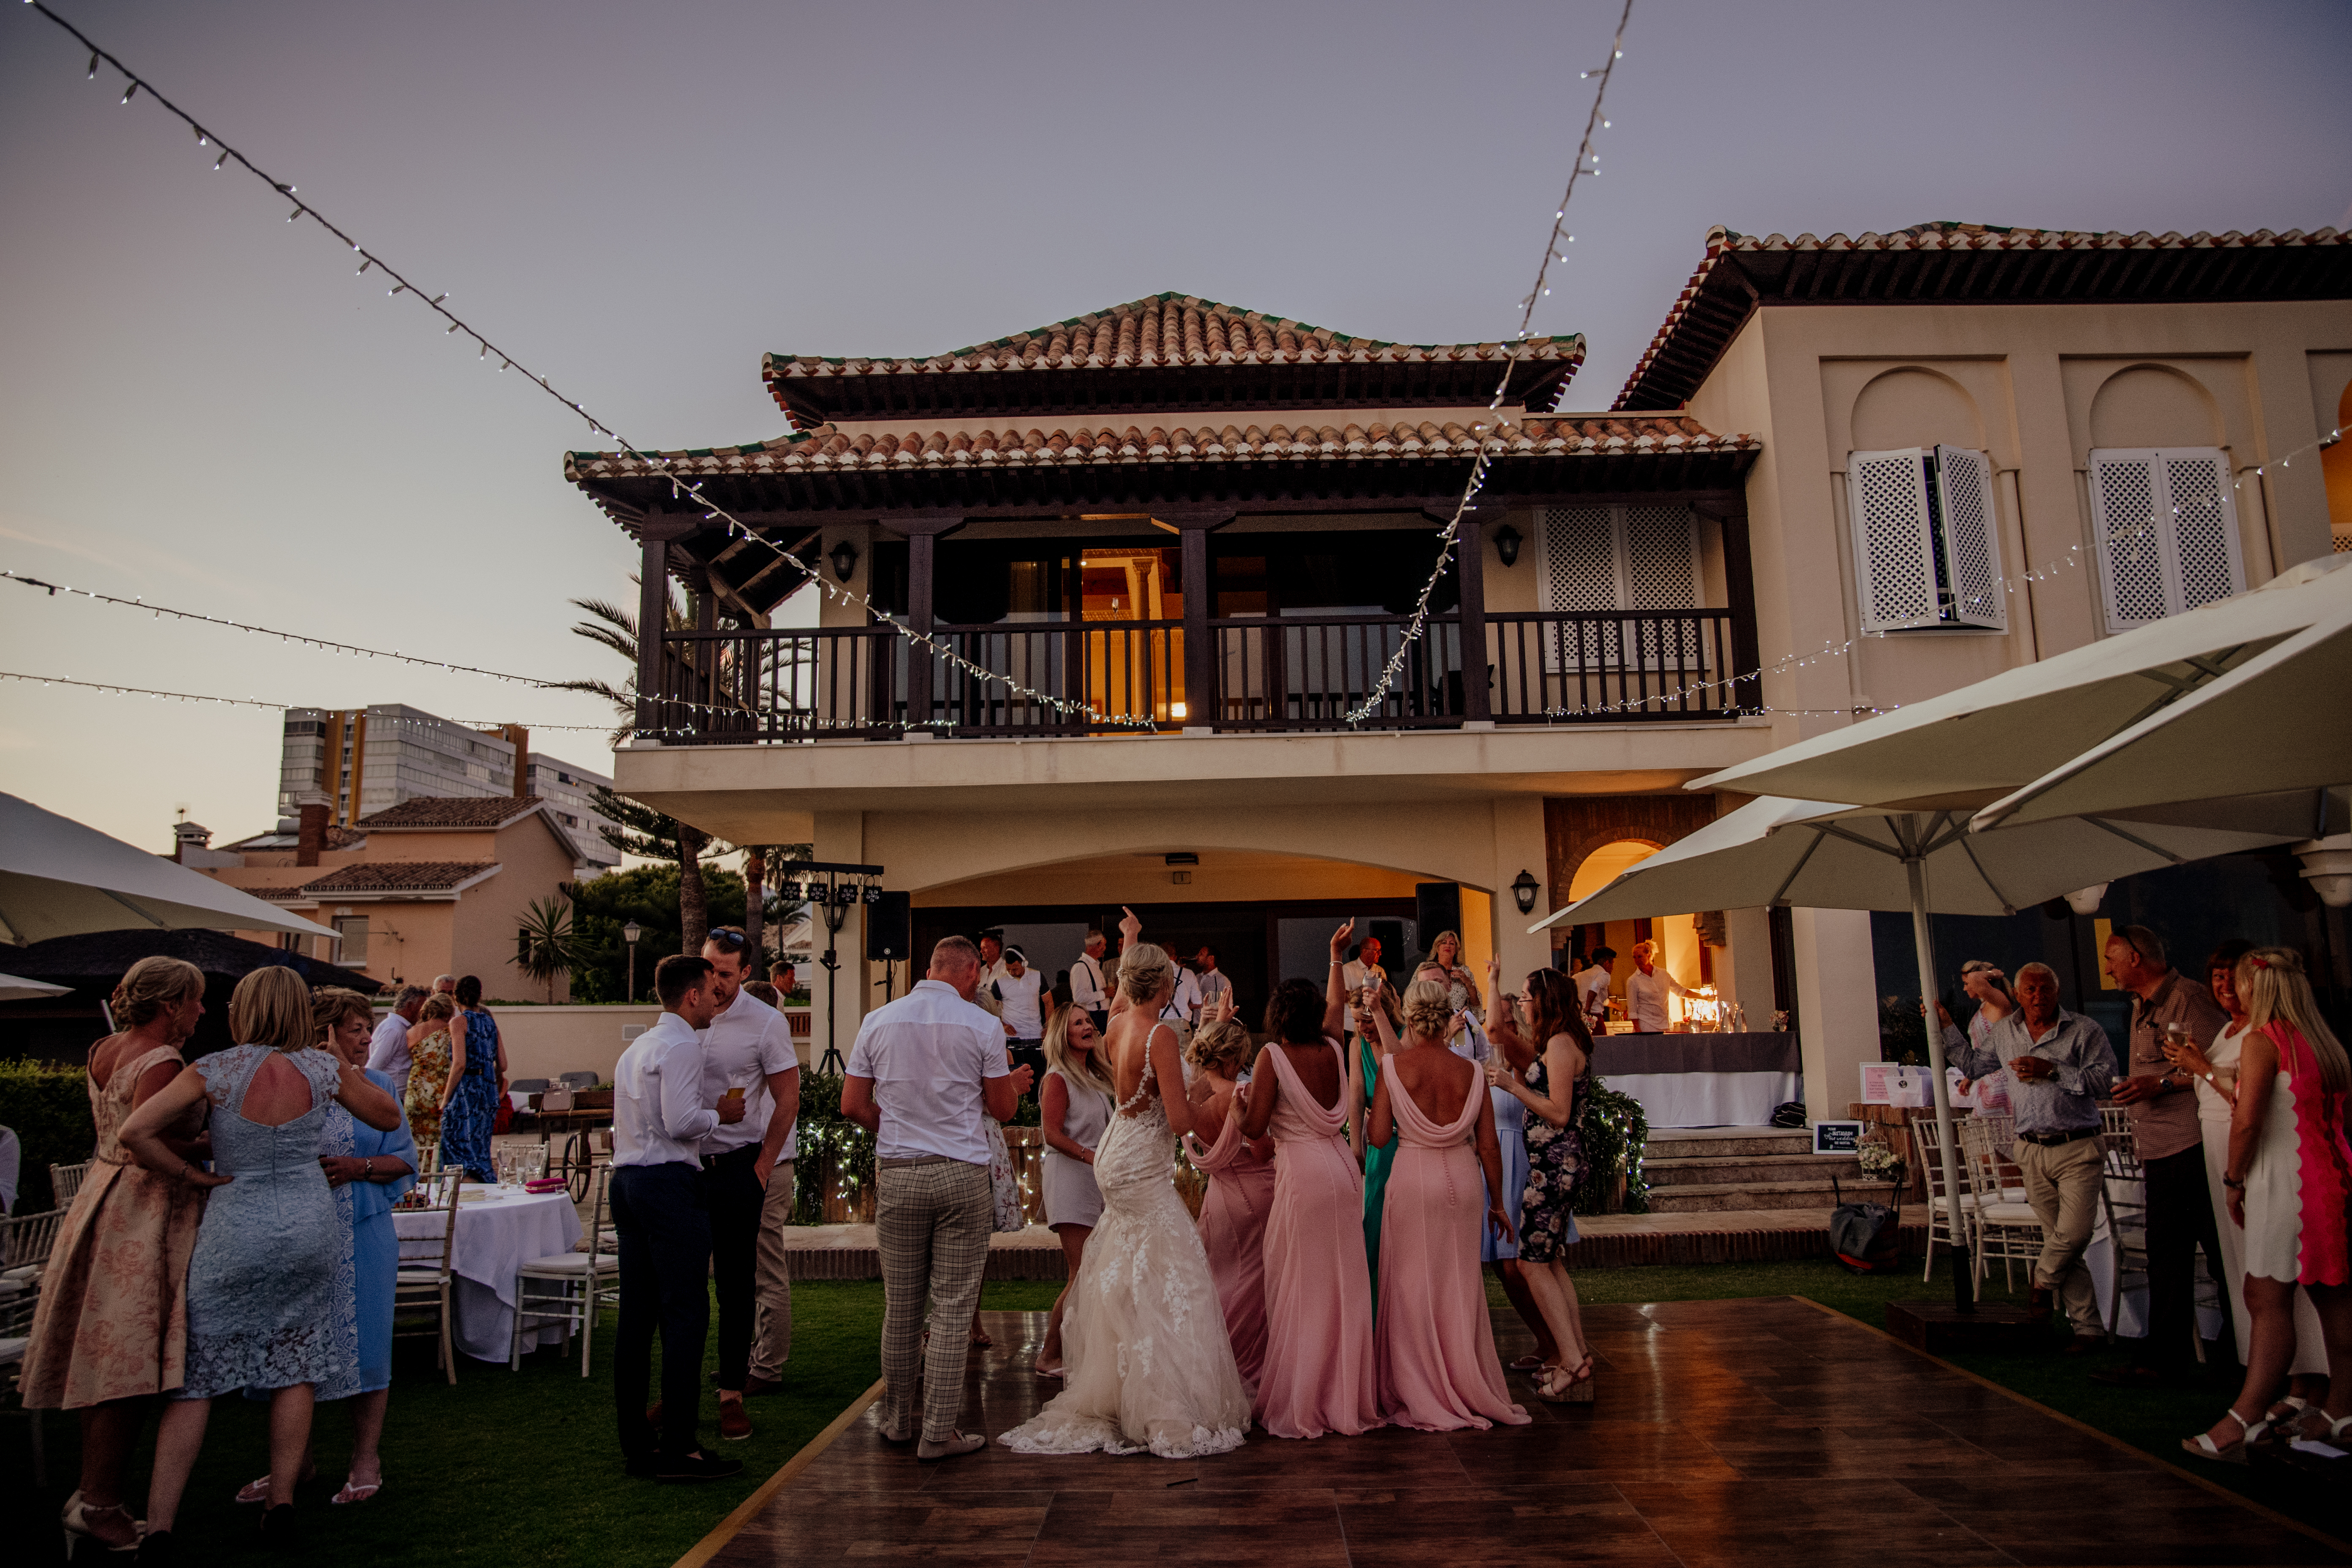 Guests on the dance floor in the villa's gardens